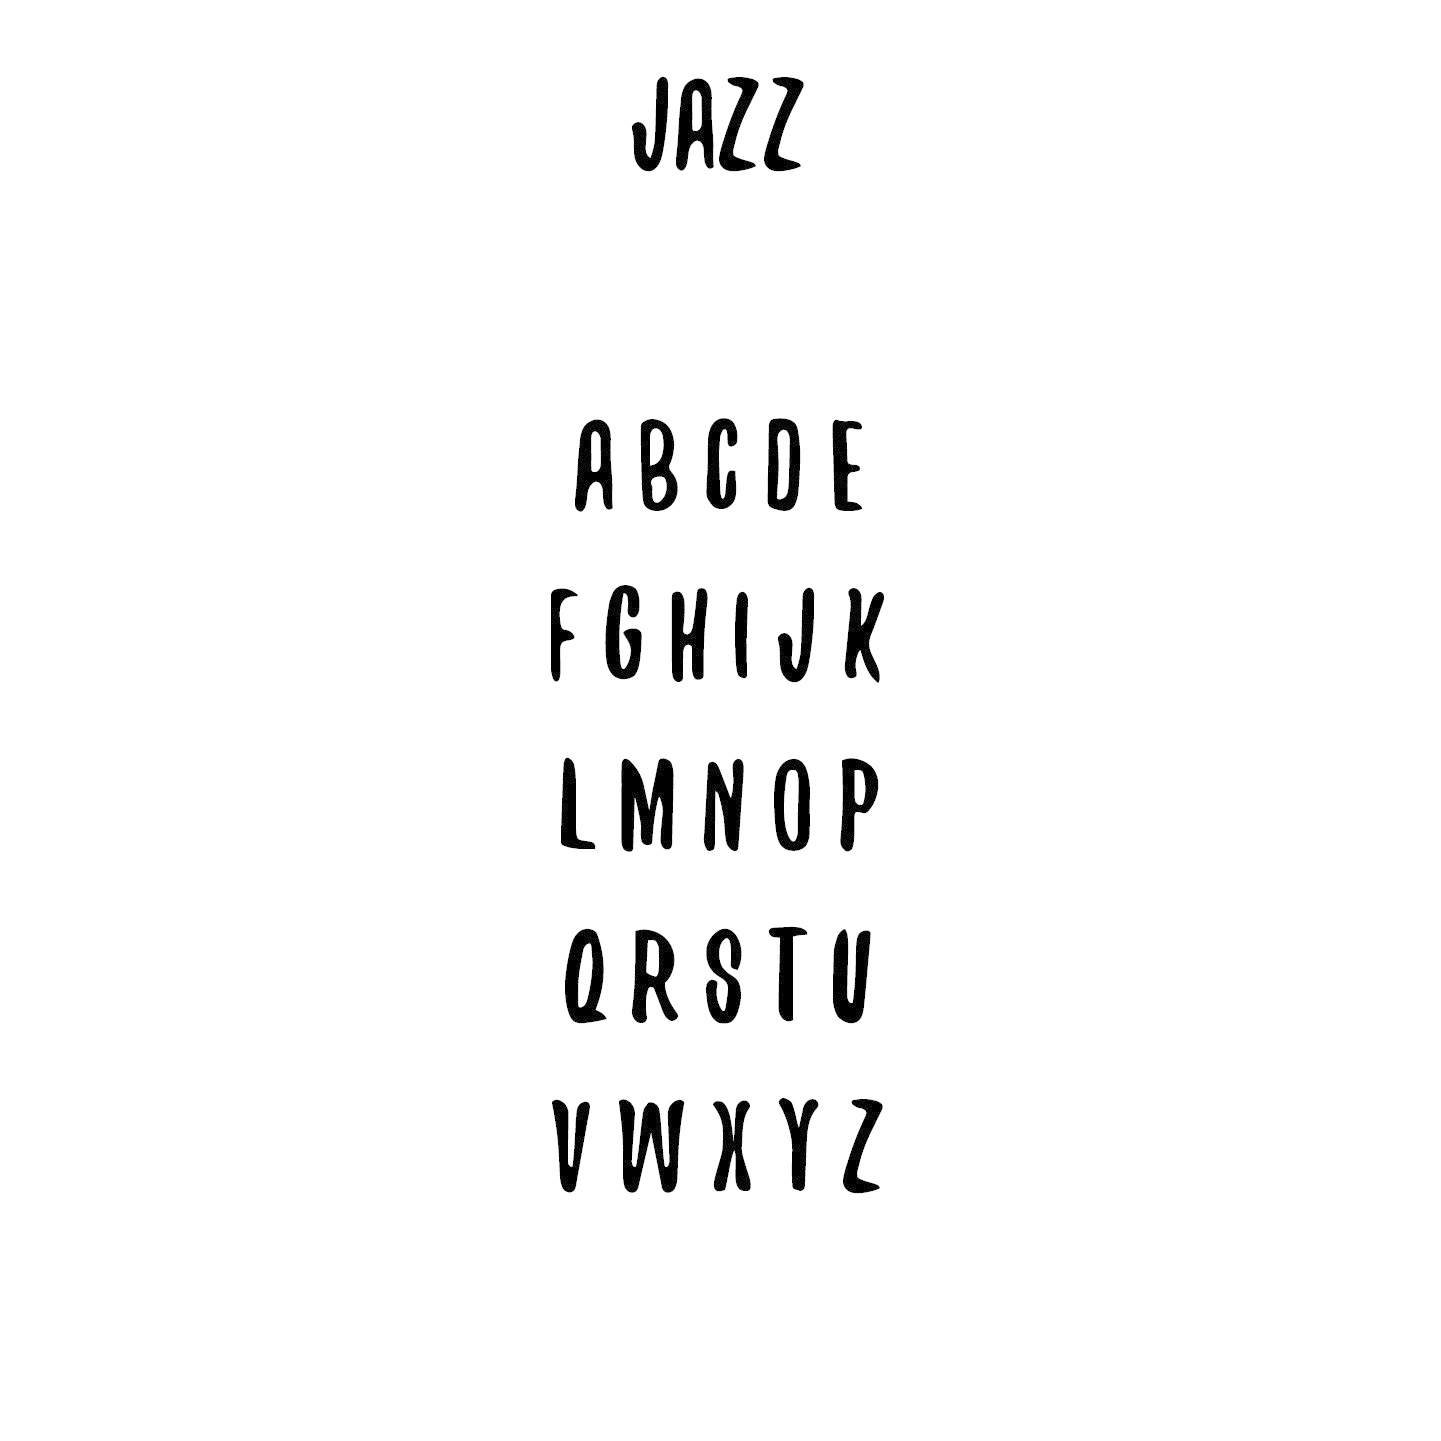 Houten tekst lettertype Jazz